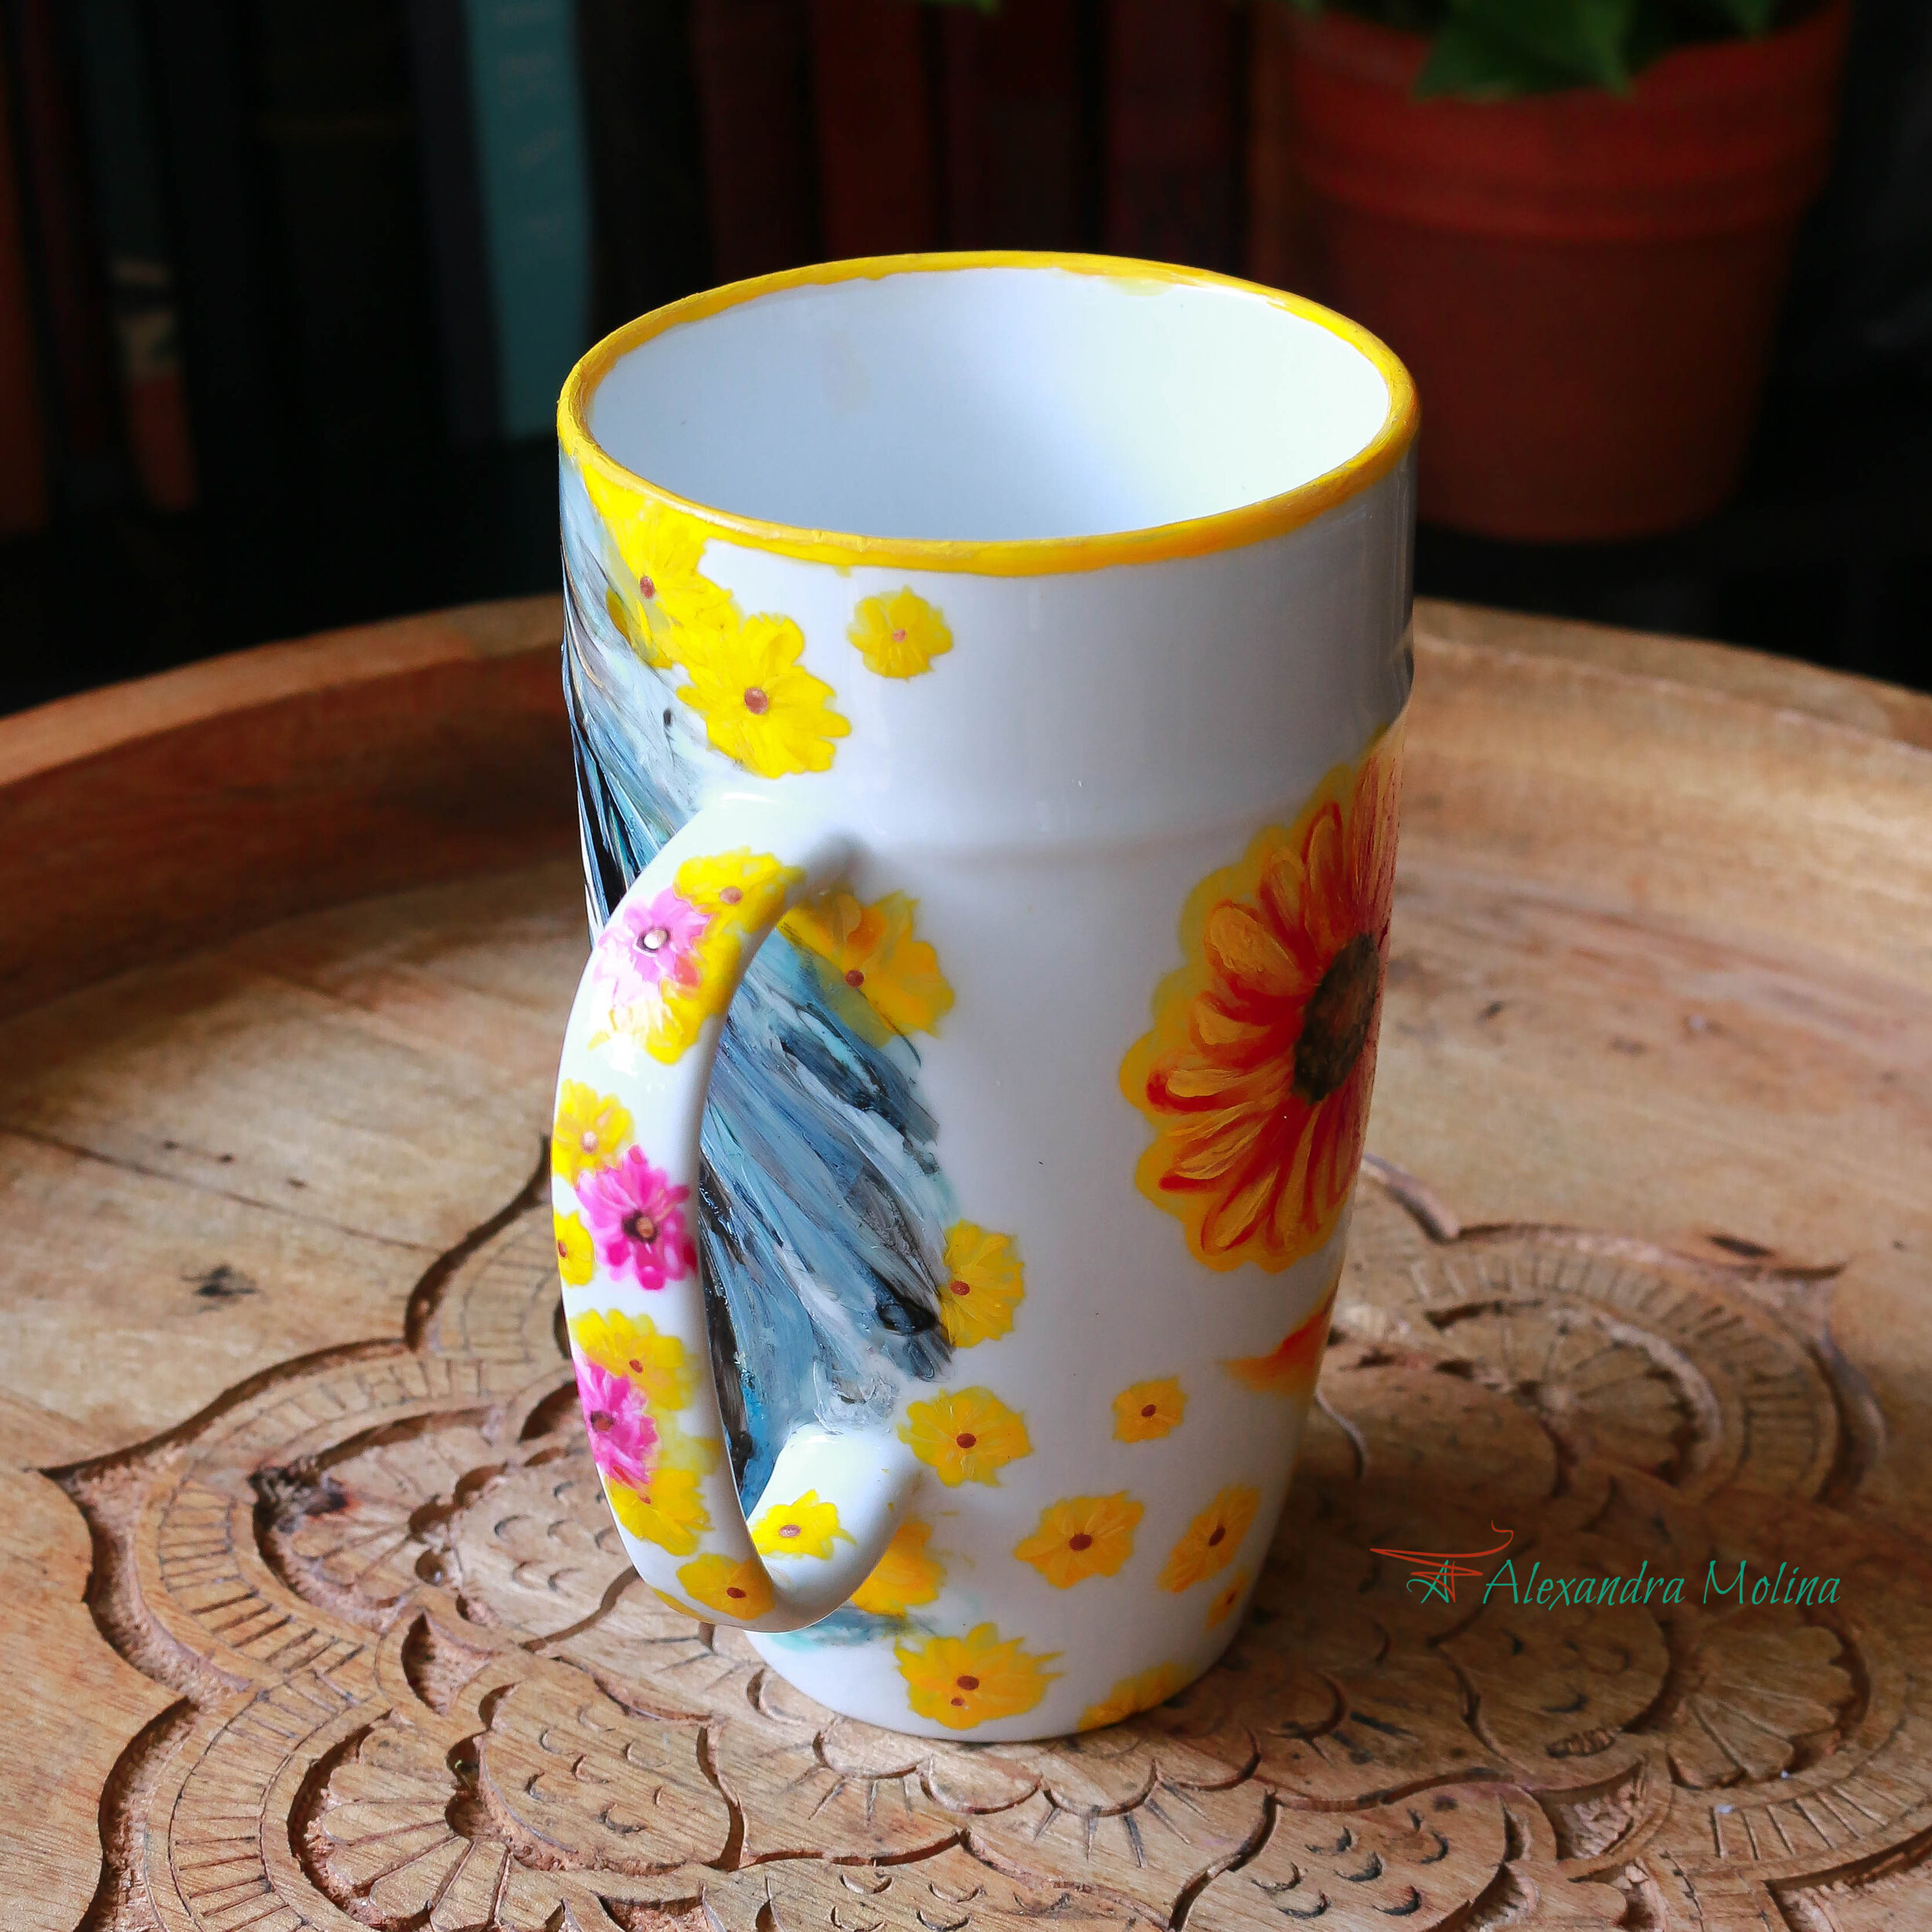 Mug Blissful2.jpg